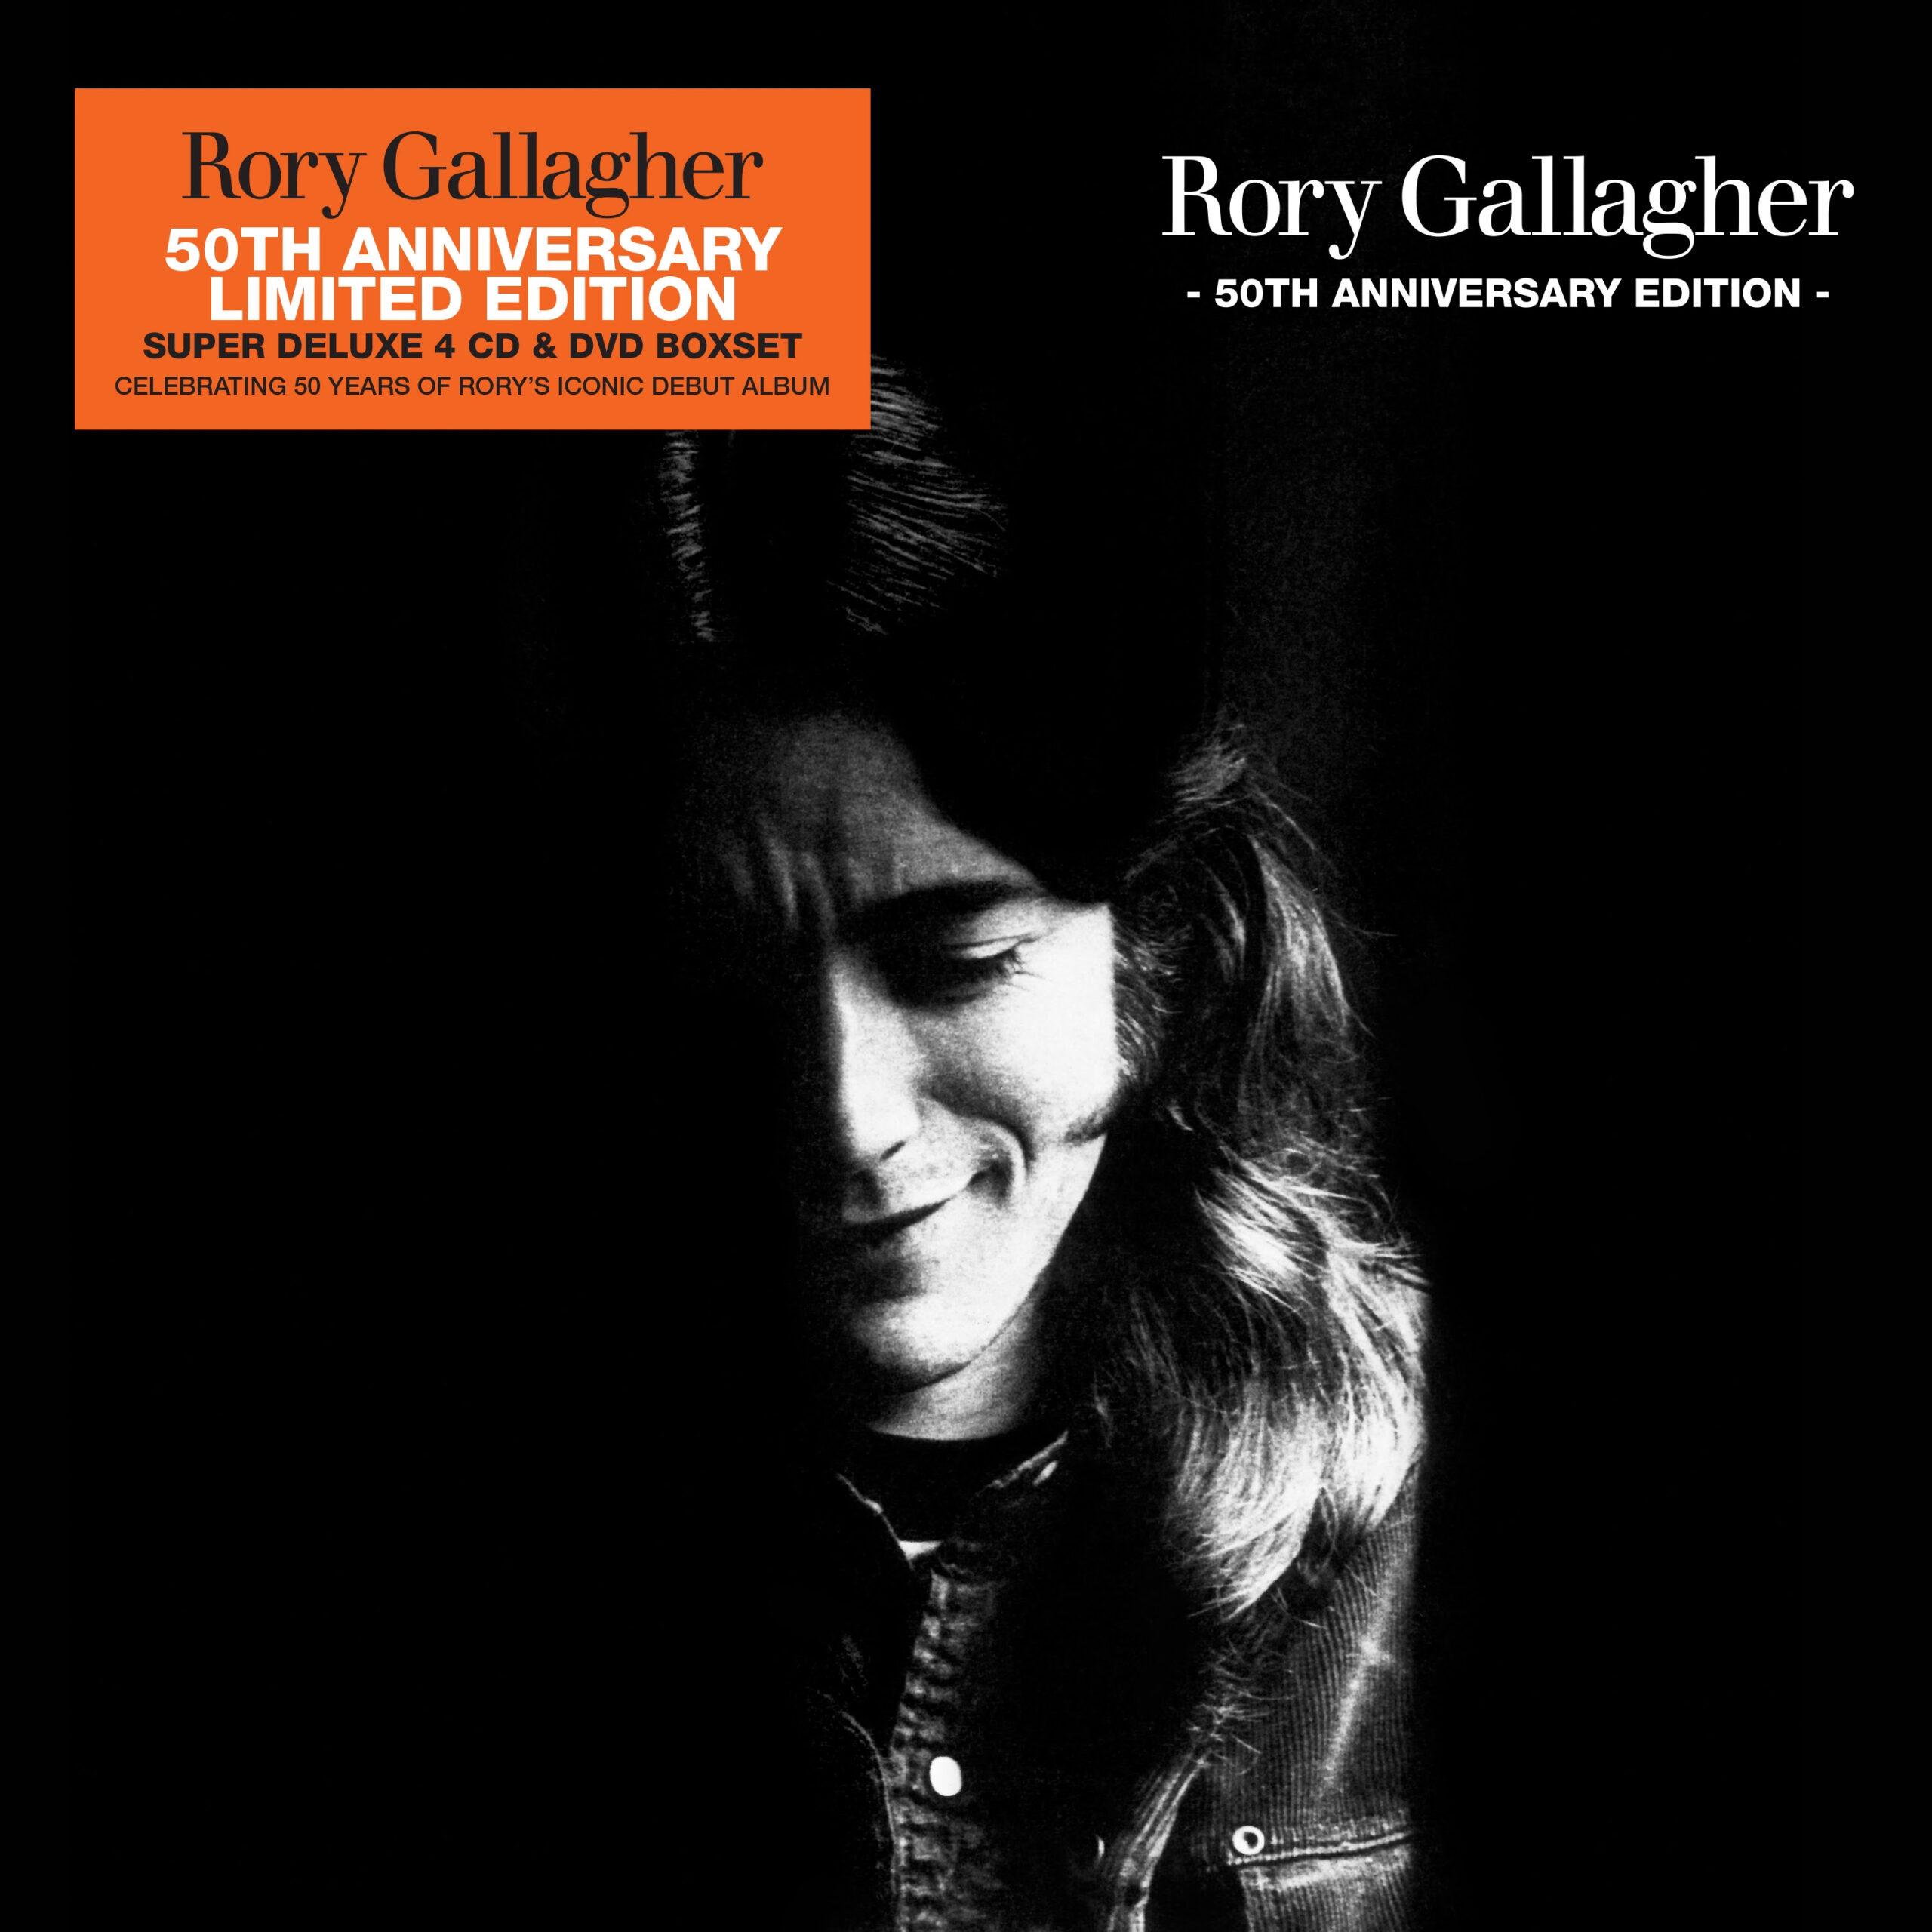 Rory Gallagher 50th anniversary 4CD+DVD box set